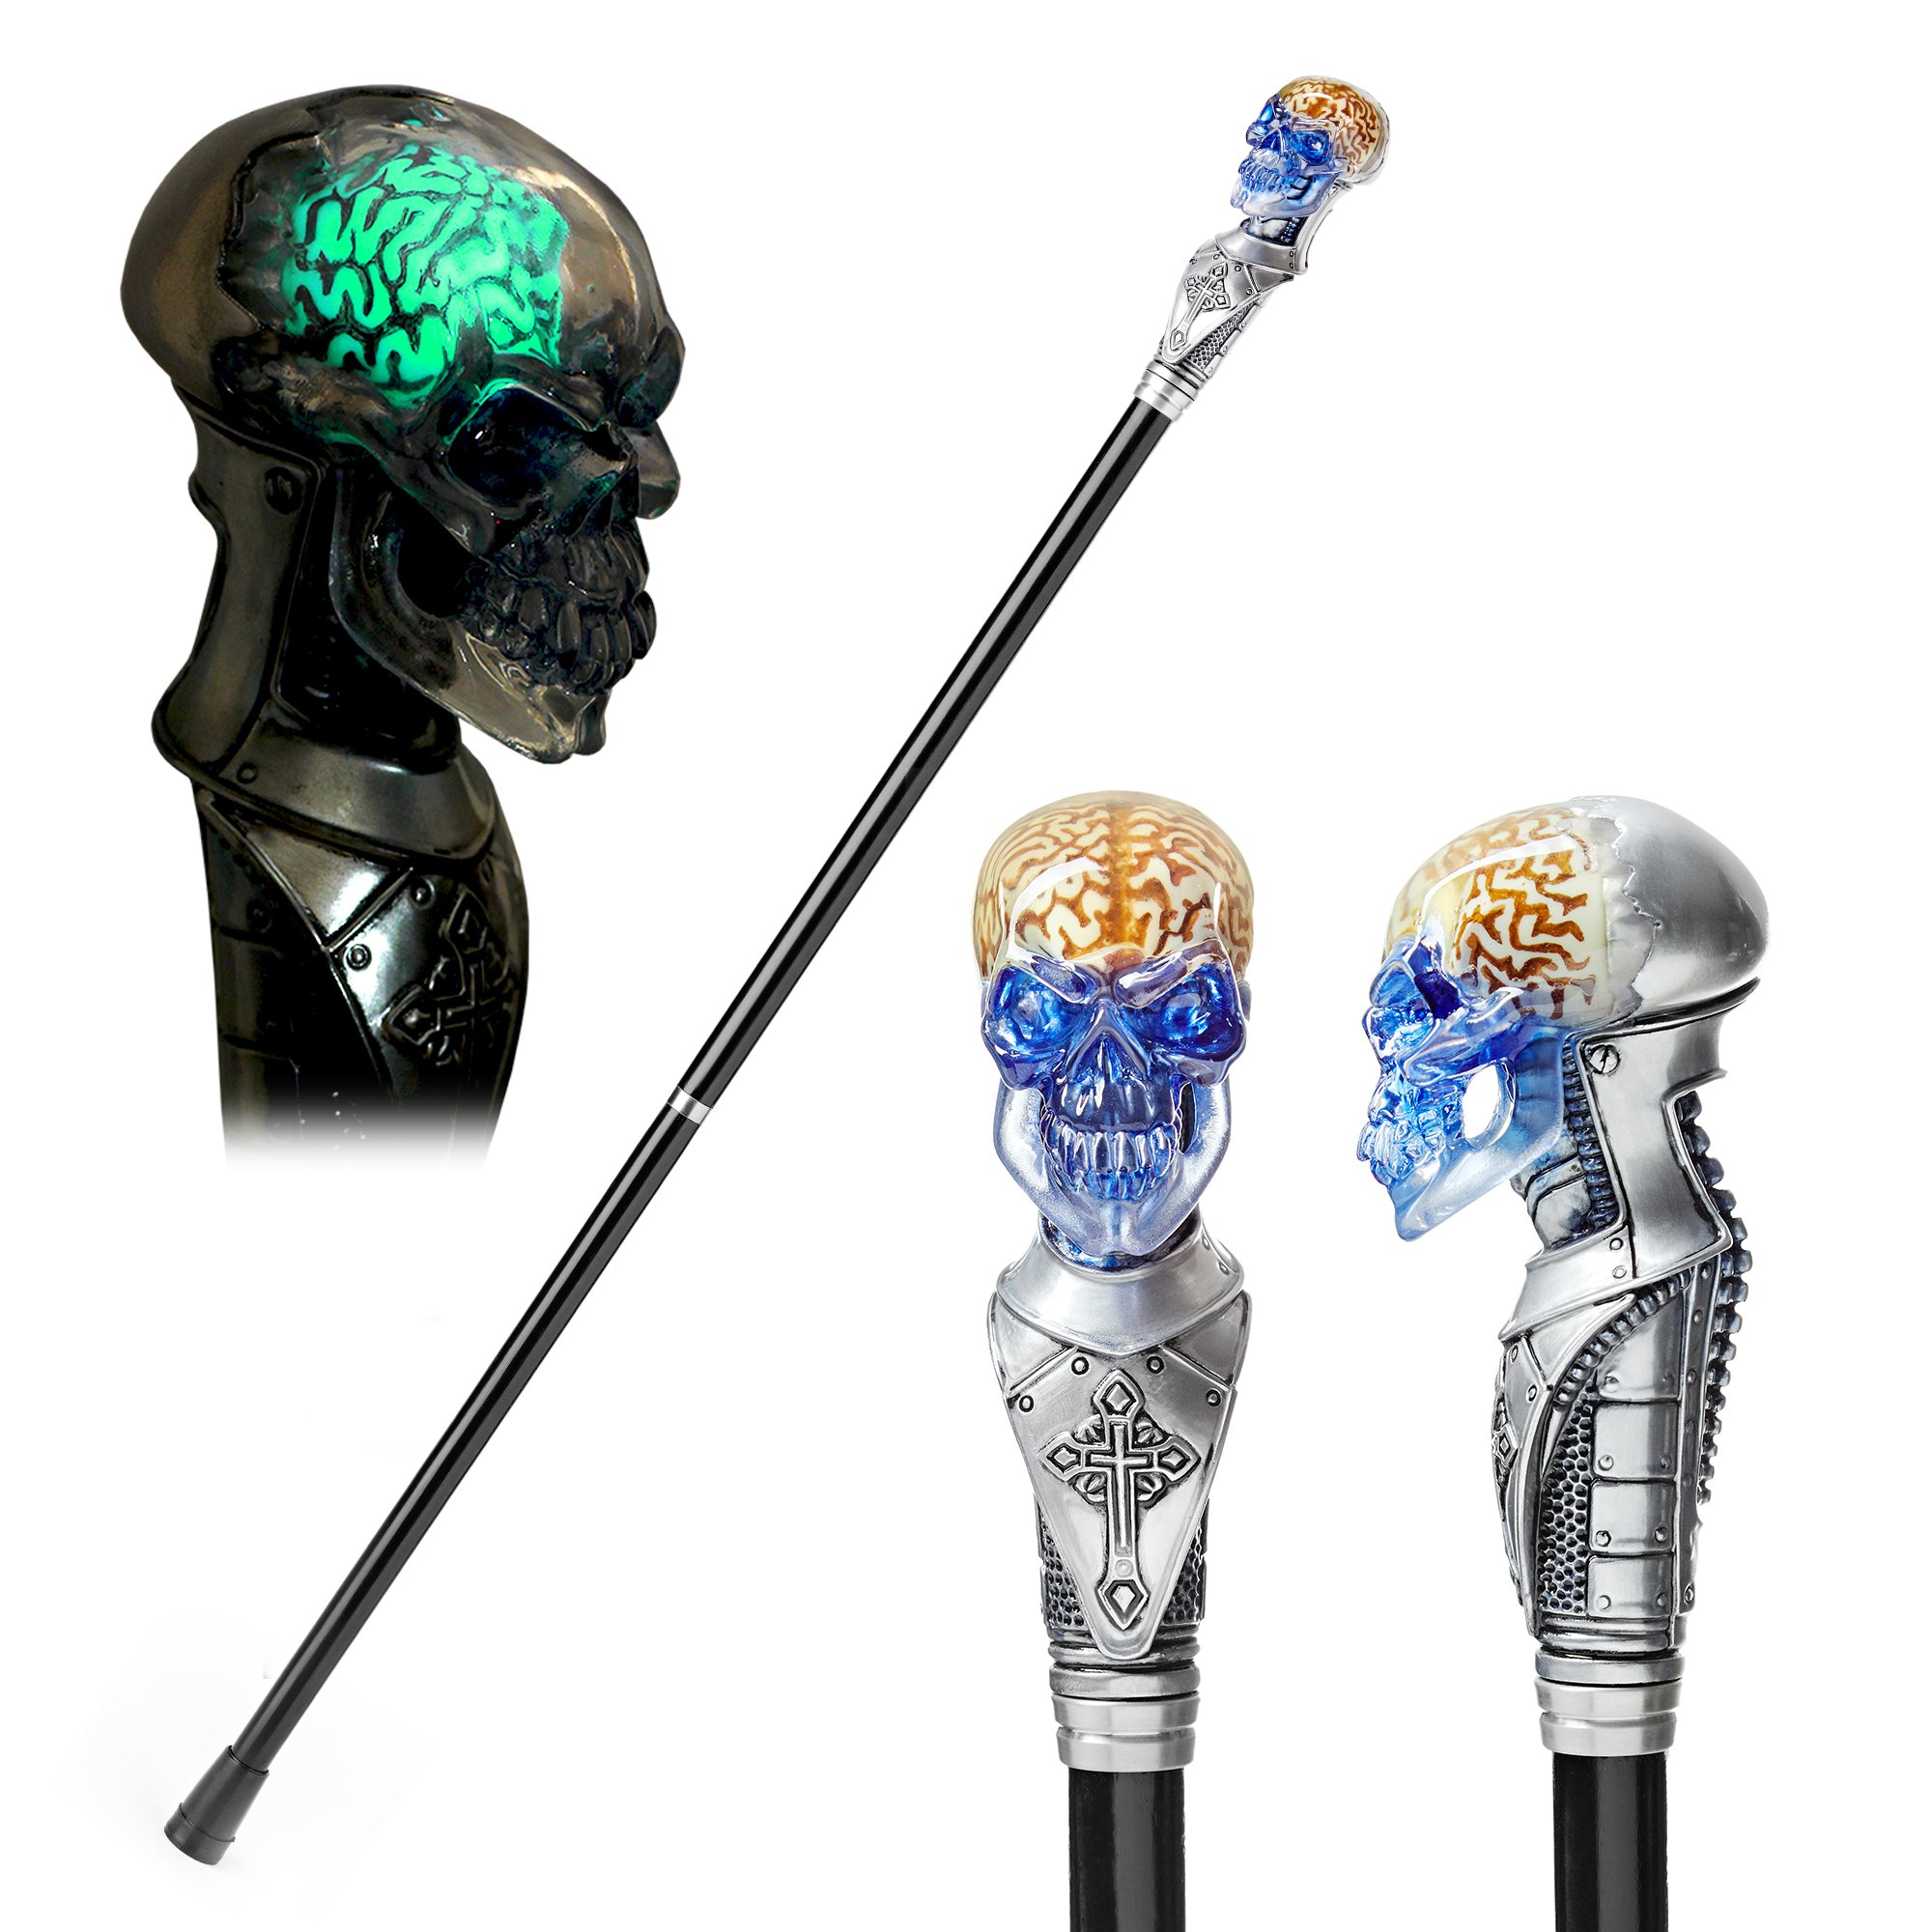 GC-Artis Skull Walking Stick Cane Glowing Knob Handle Costume Party Black Wooden Shaft Folding by GC-Artis